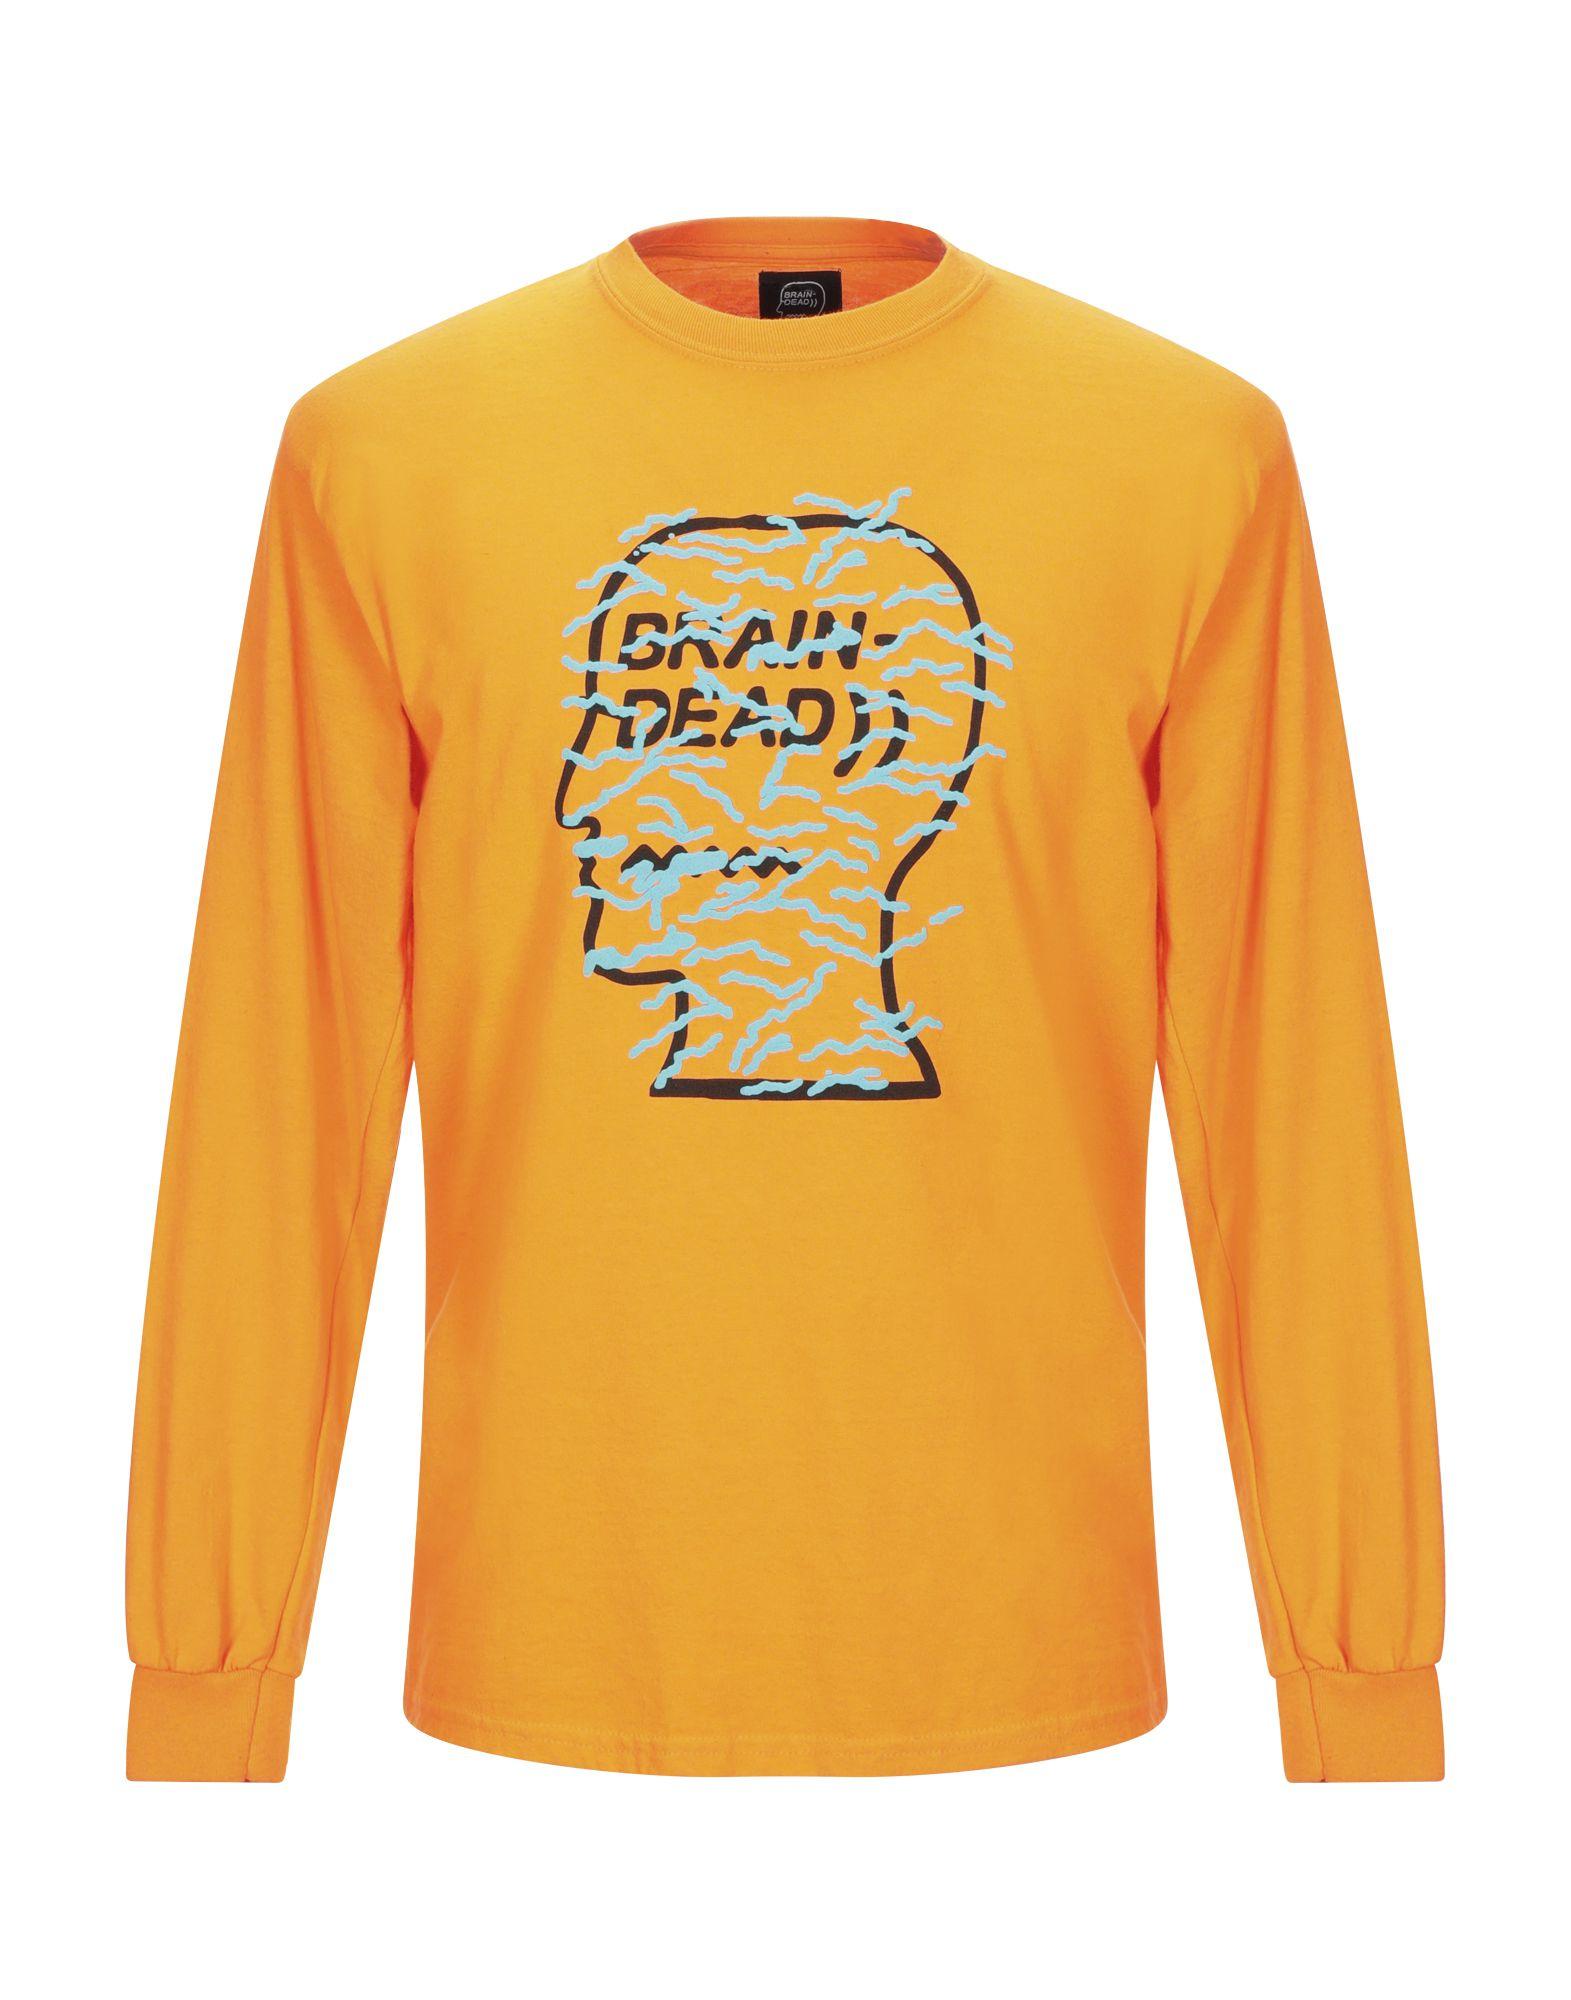 T-Shirt Brain Dead uomo - - 12333387KP  hoher Rabatt